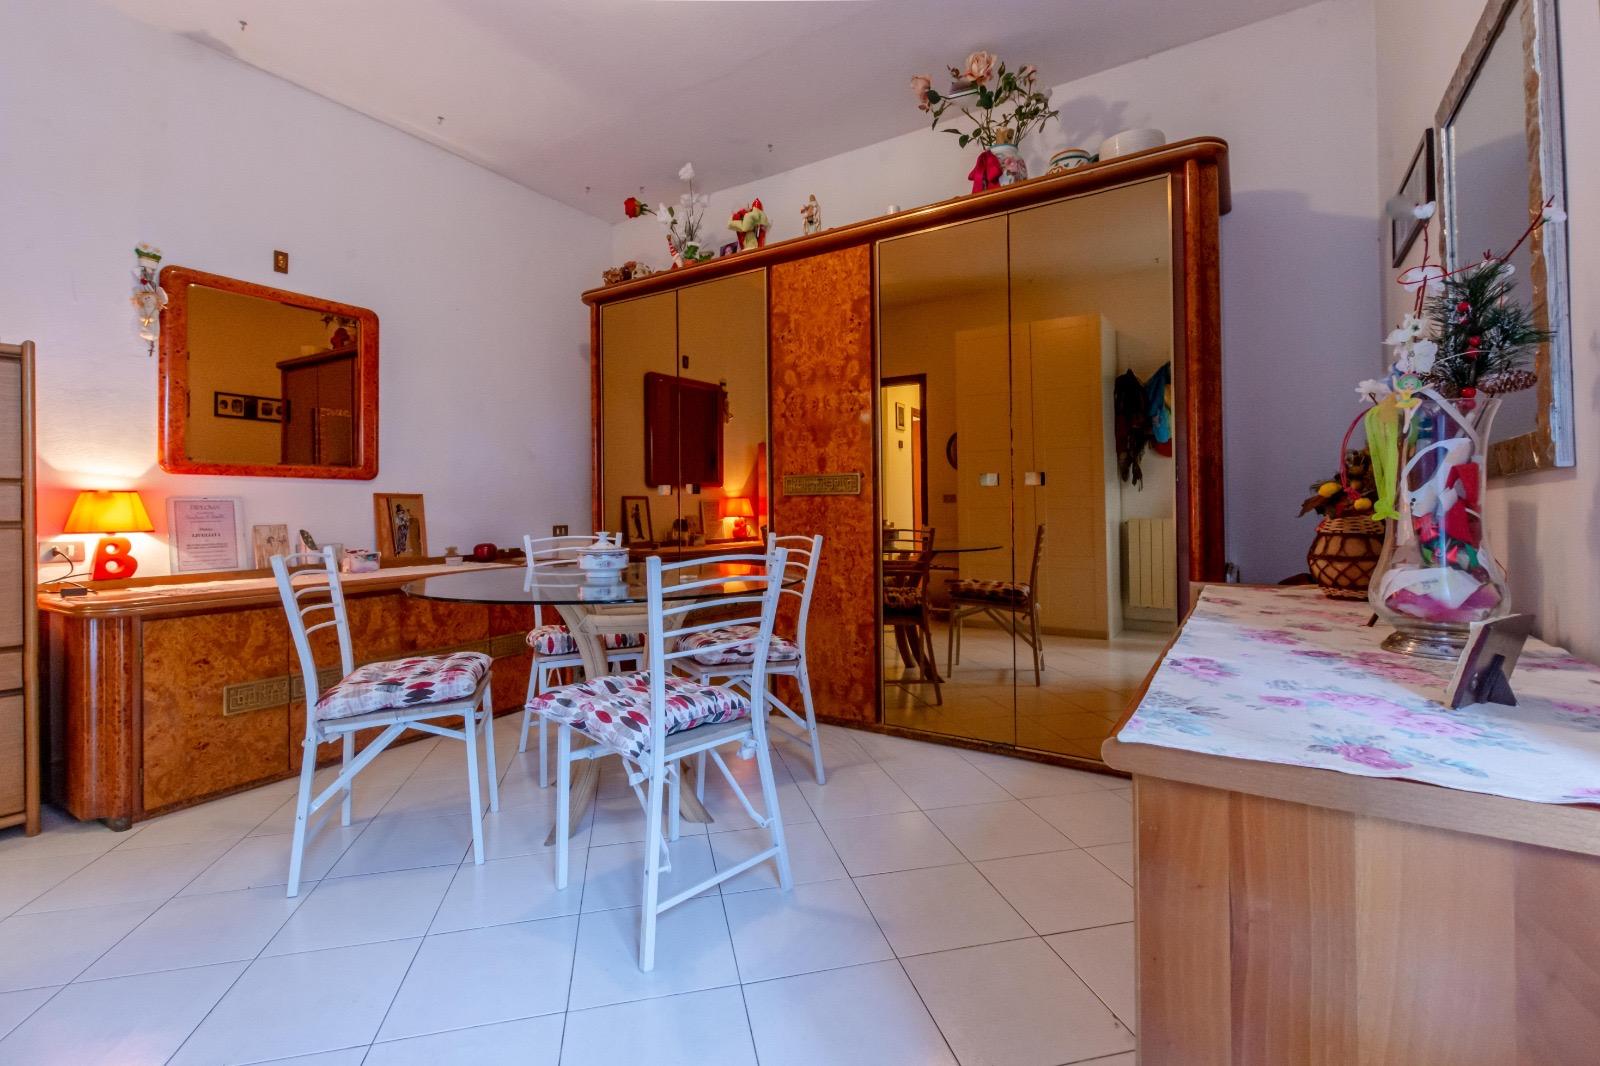 Cozy apartment in Viareggio with a garden